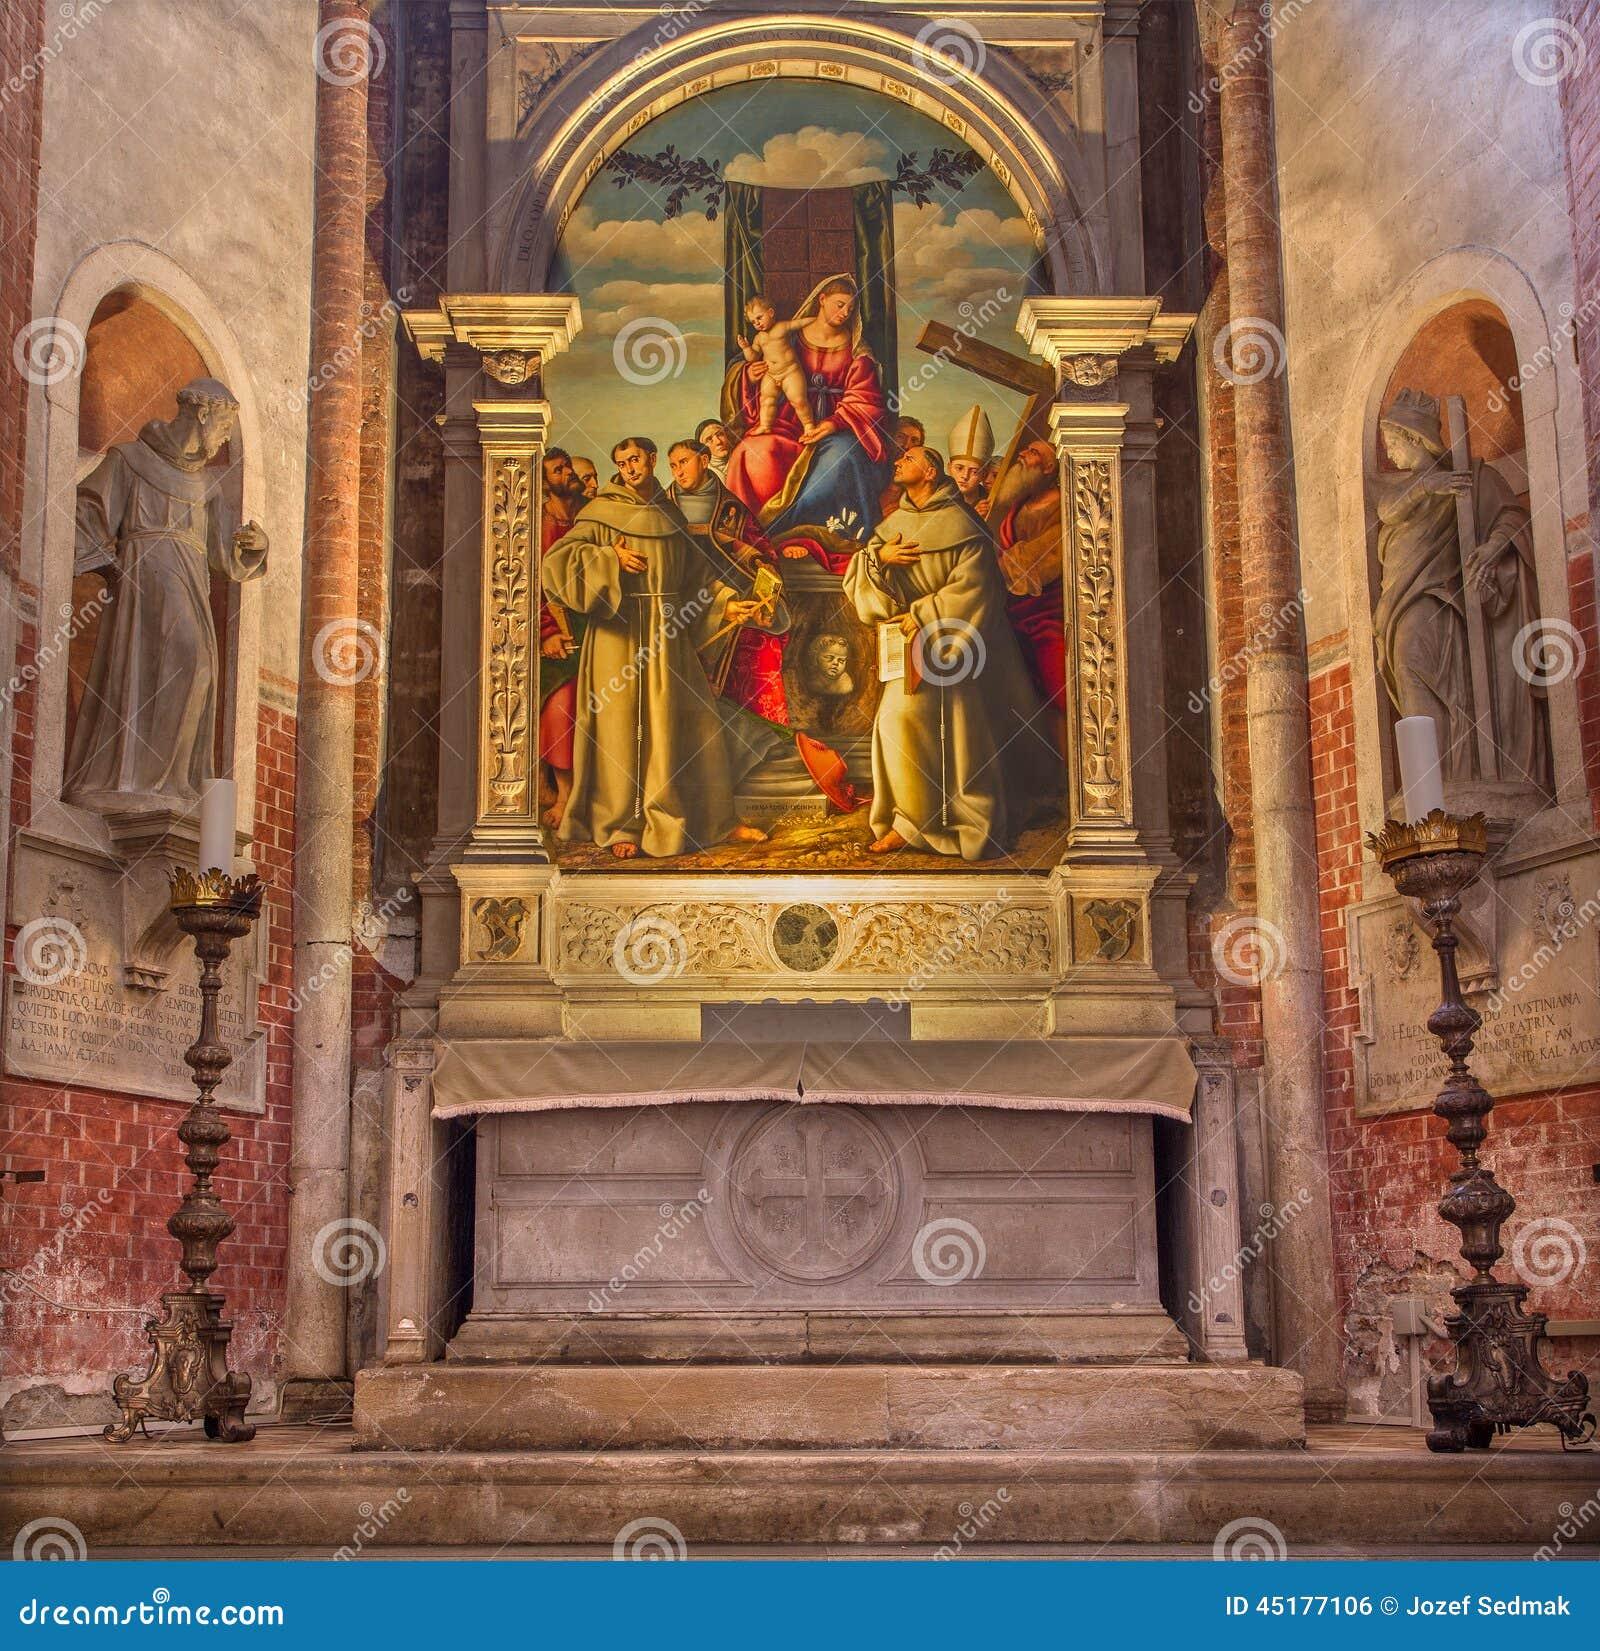 VENEDIG, ITALIEN - 12. MÄRZ 2014: Madonna mit den ersten Franziskanermärtyrern in Kirche Basilikadi Santa Maria Gloriosa-dei Frar